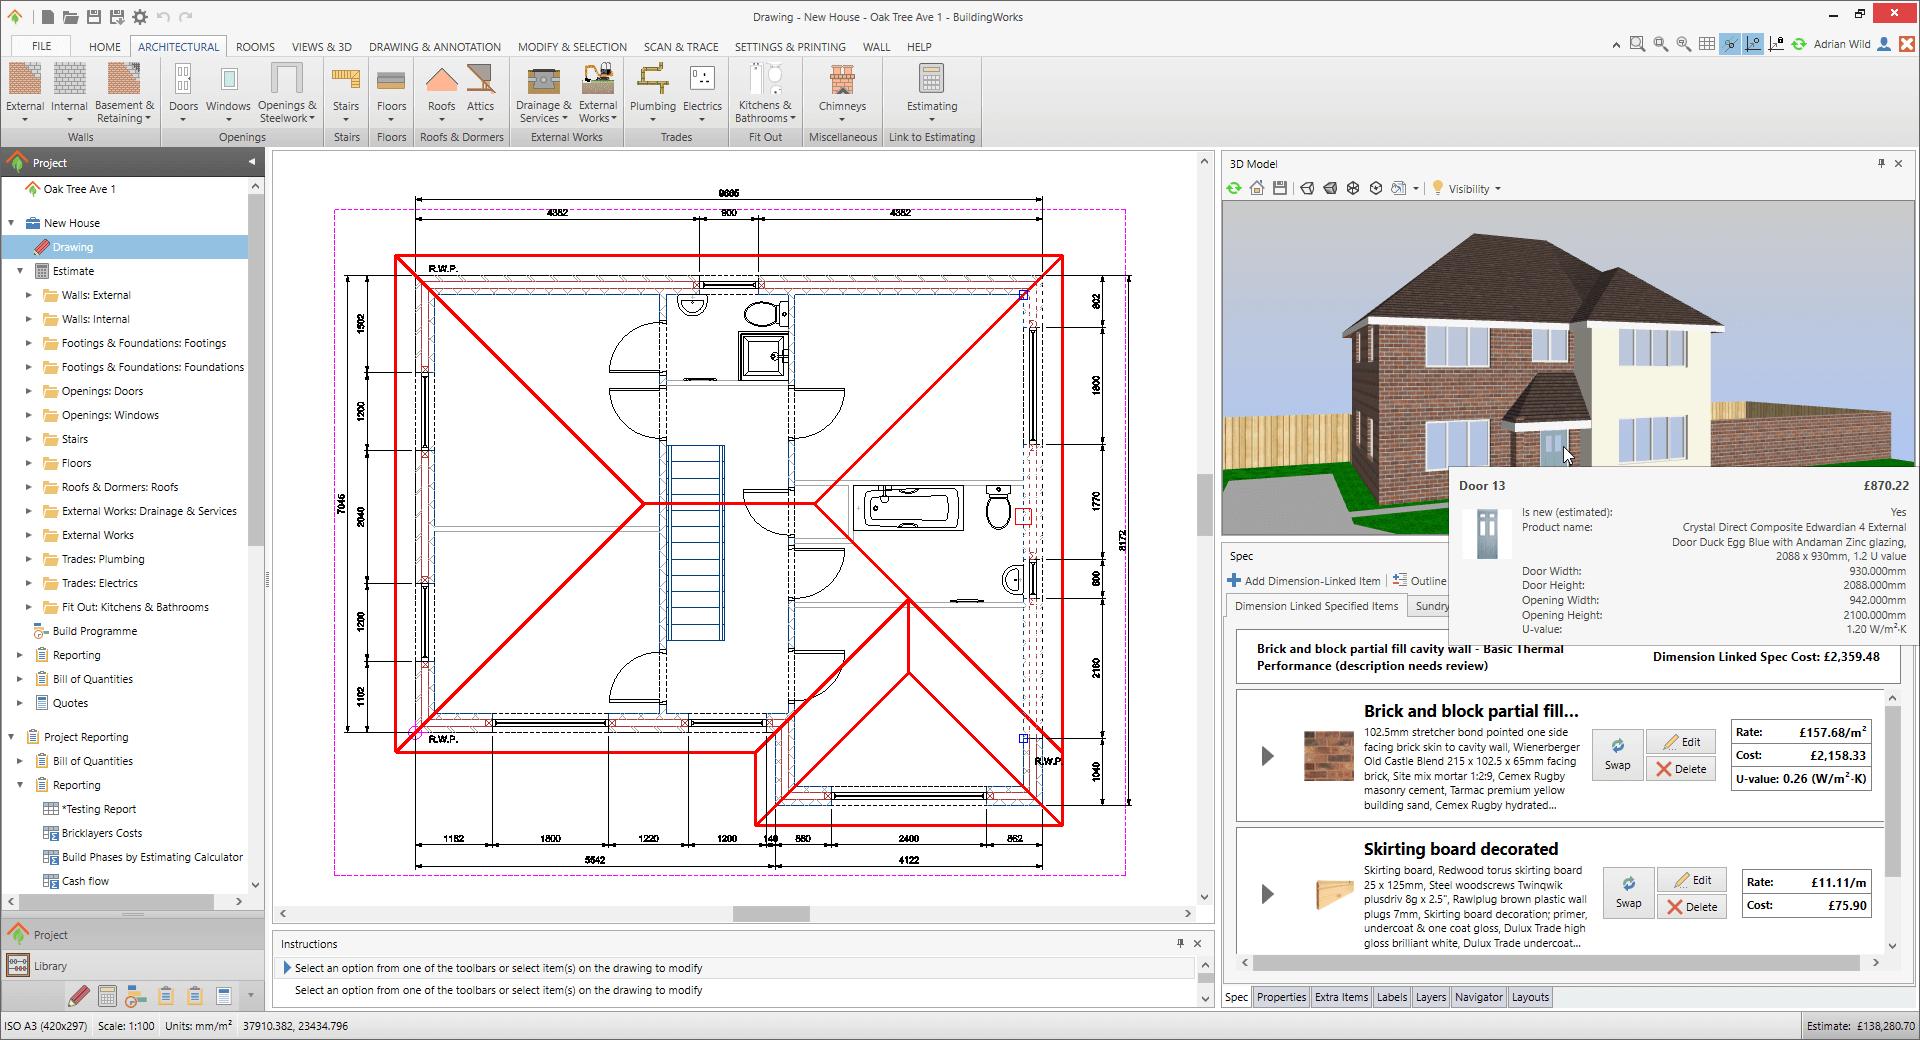 BuildingWorks with spec copy